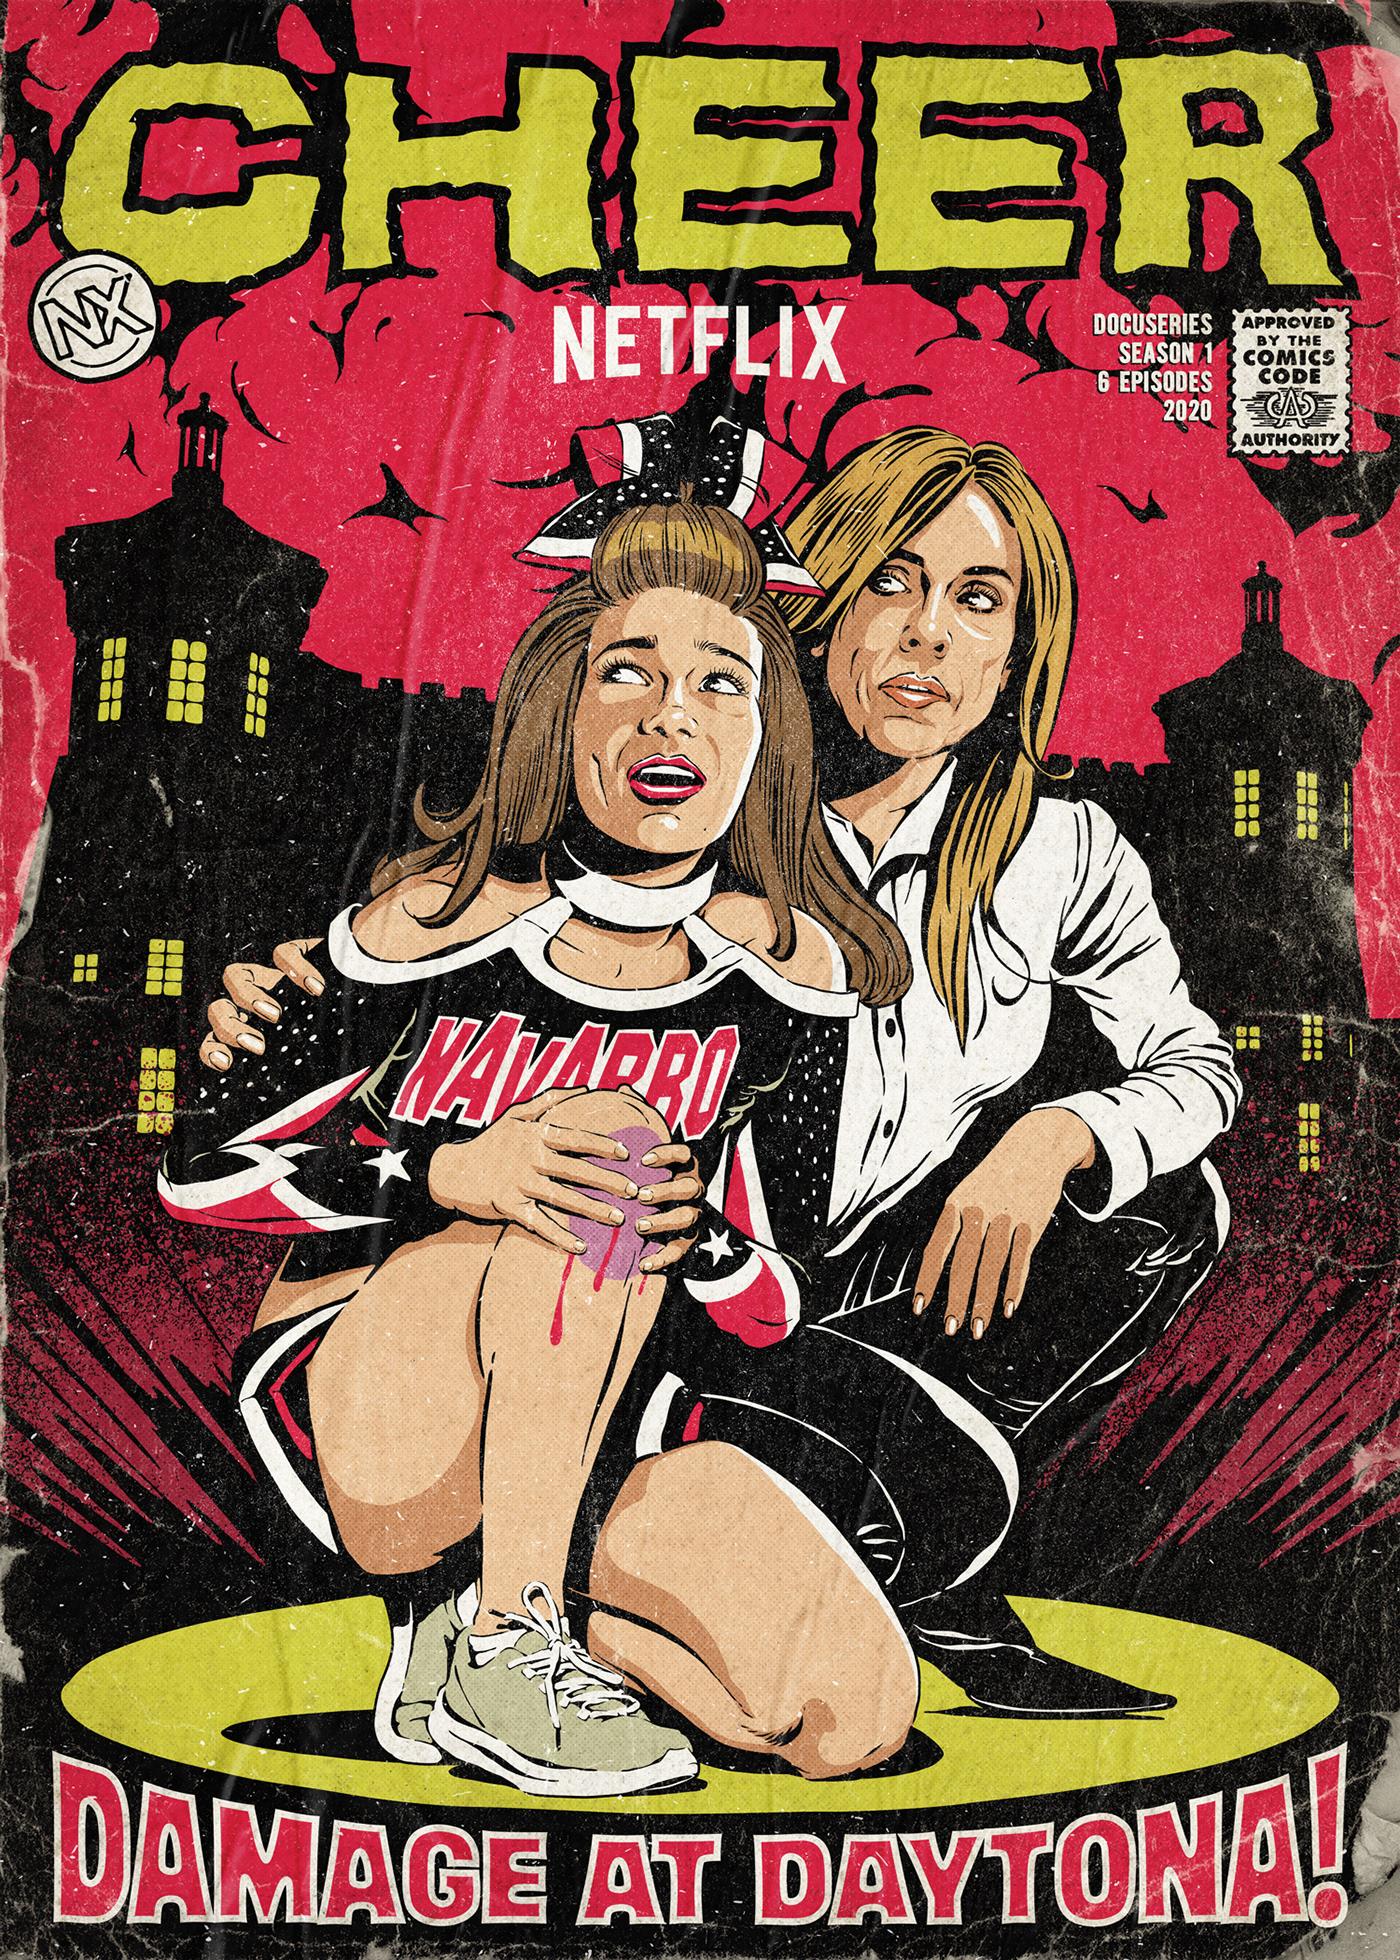 cheer comic books docuseries horror Netflix Retro series vintage